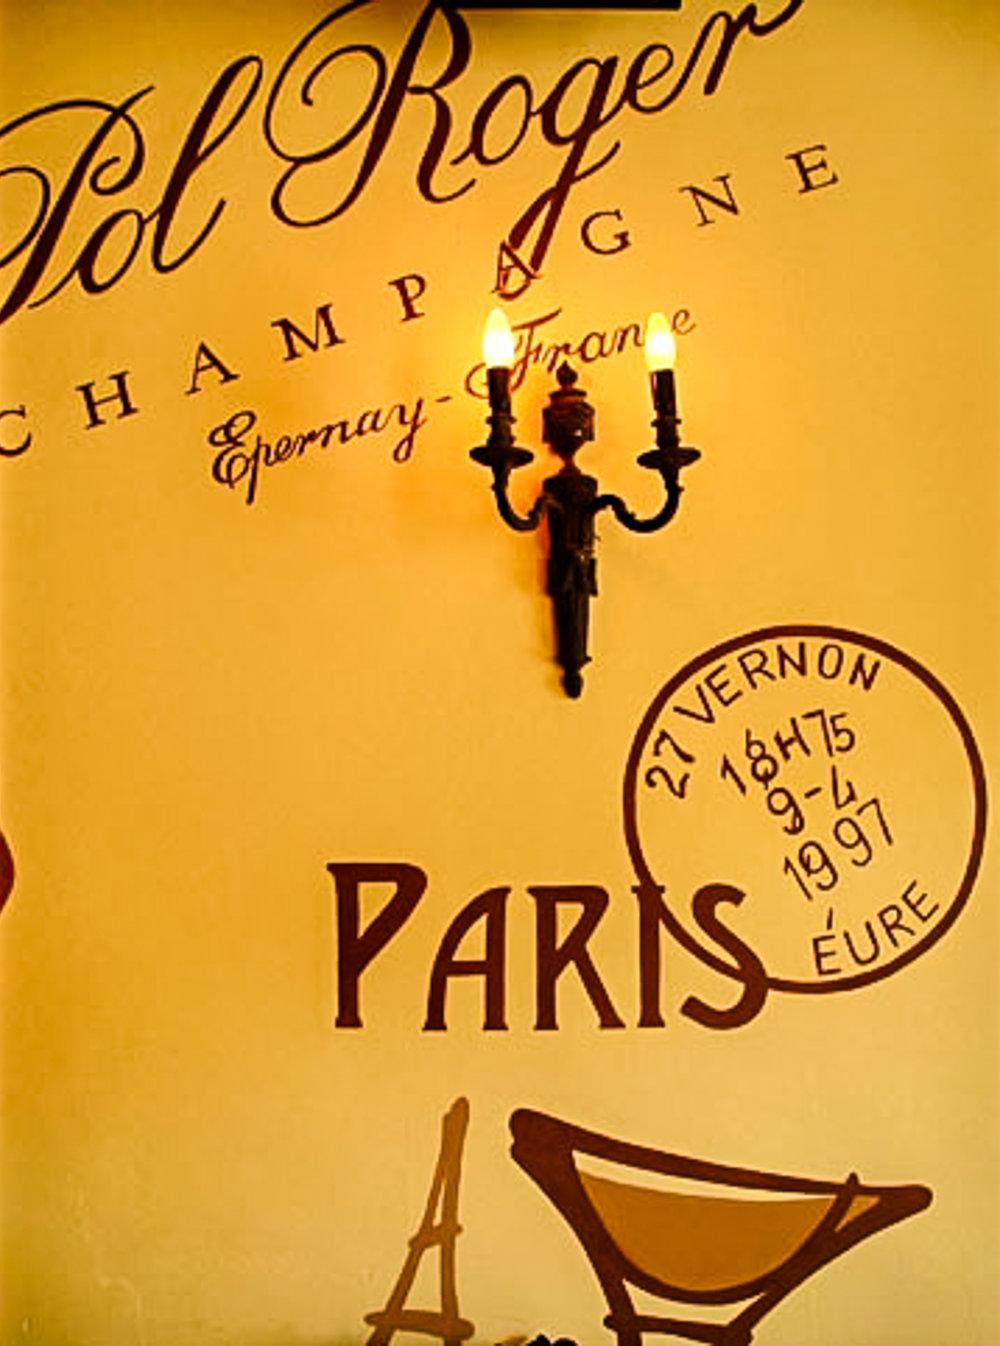 Parisk.jpg